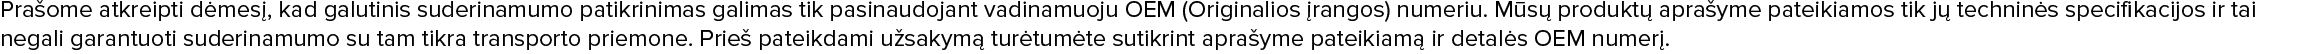 MANN-FILTER 1471 765, 1802 052, 6G9N-9176-AB, 30 681 552, 30794824 Kuro filtras